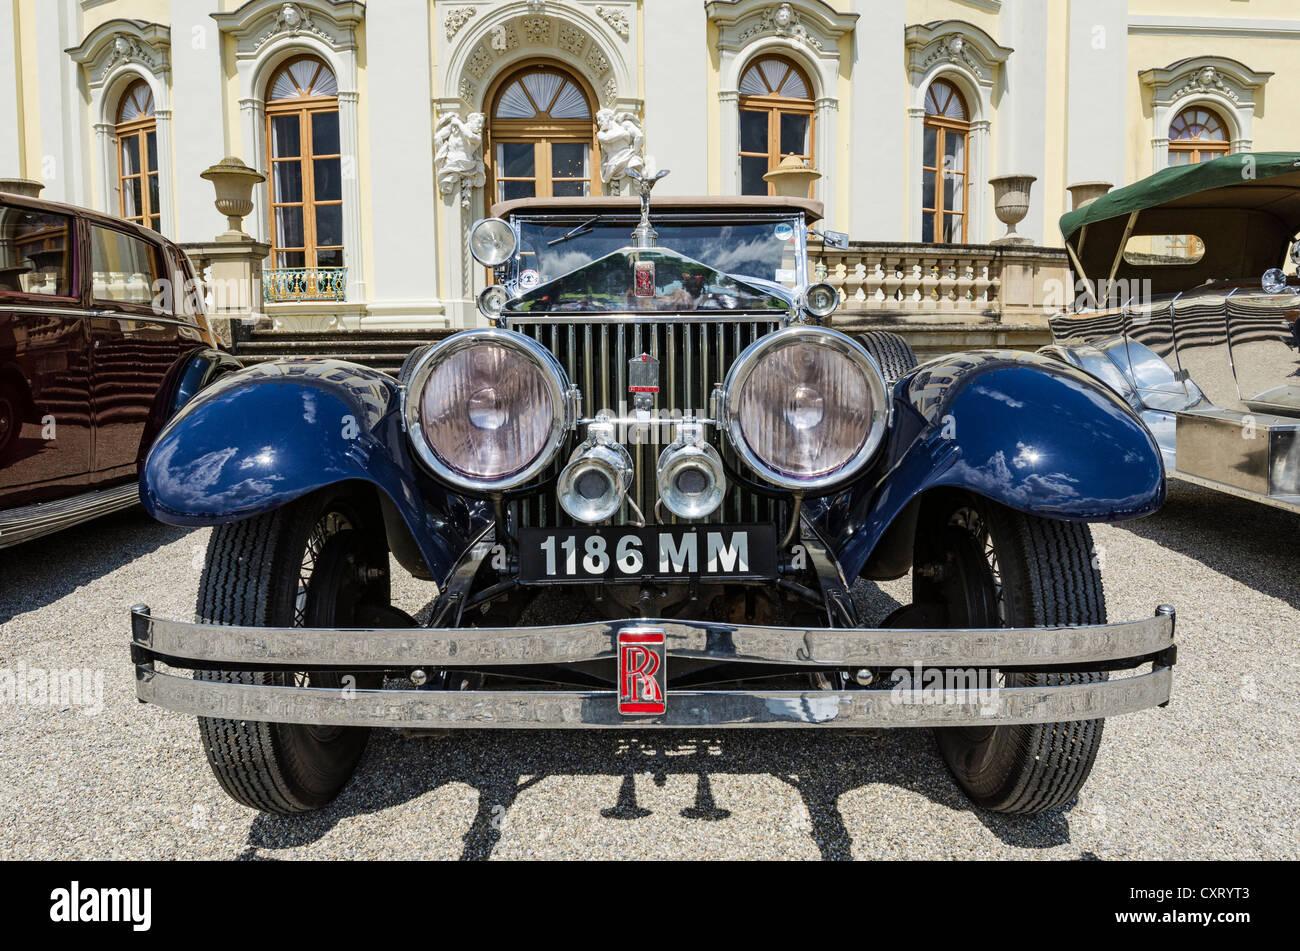 Vorderansicht des Rolls-Royce Oldtimer, Classics meets Barock Oldtimer Treffen, Schloss Ludwigsburg, Regierungsbezirk Stockbild